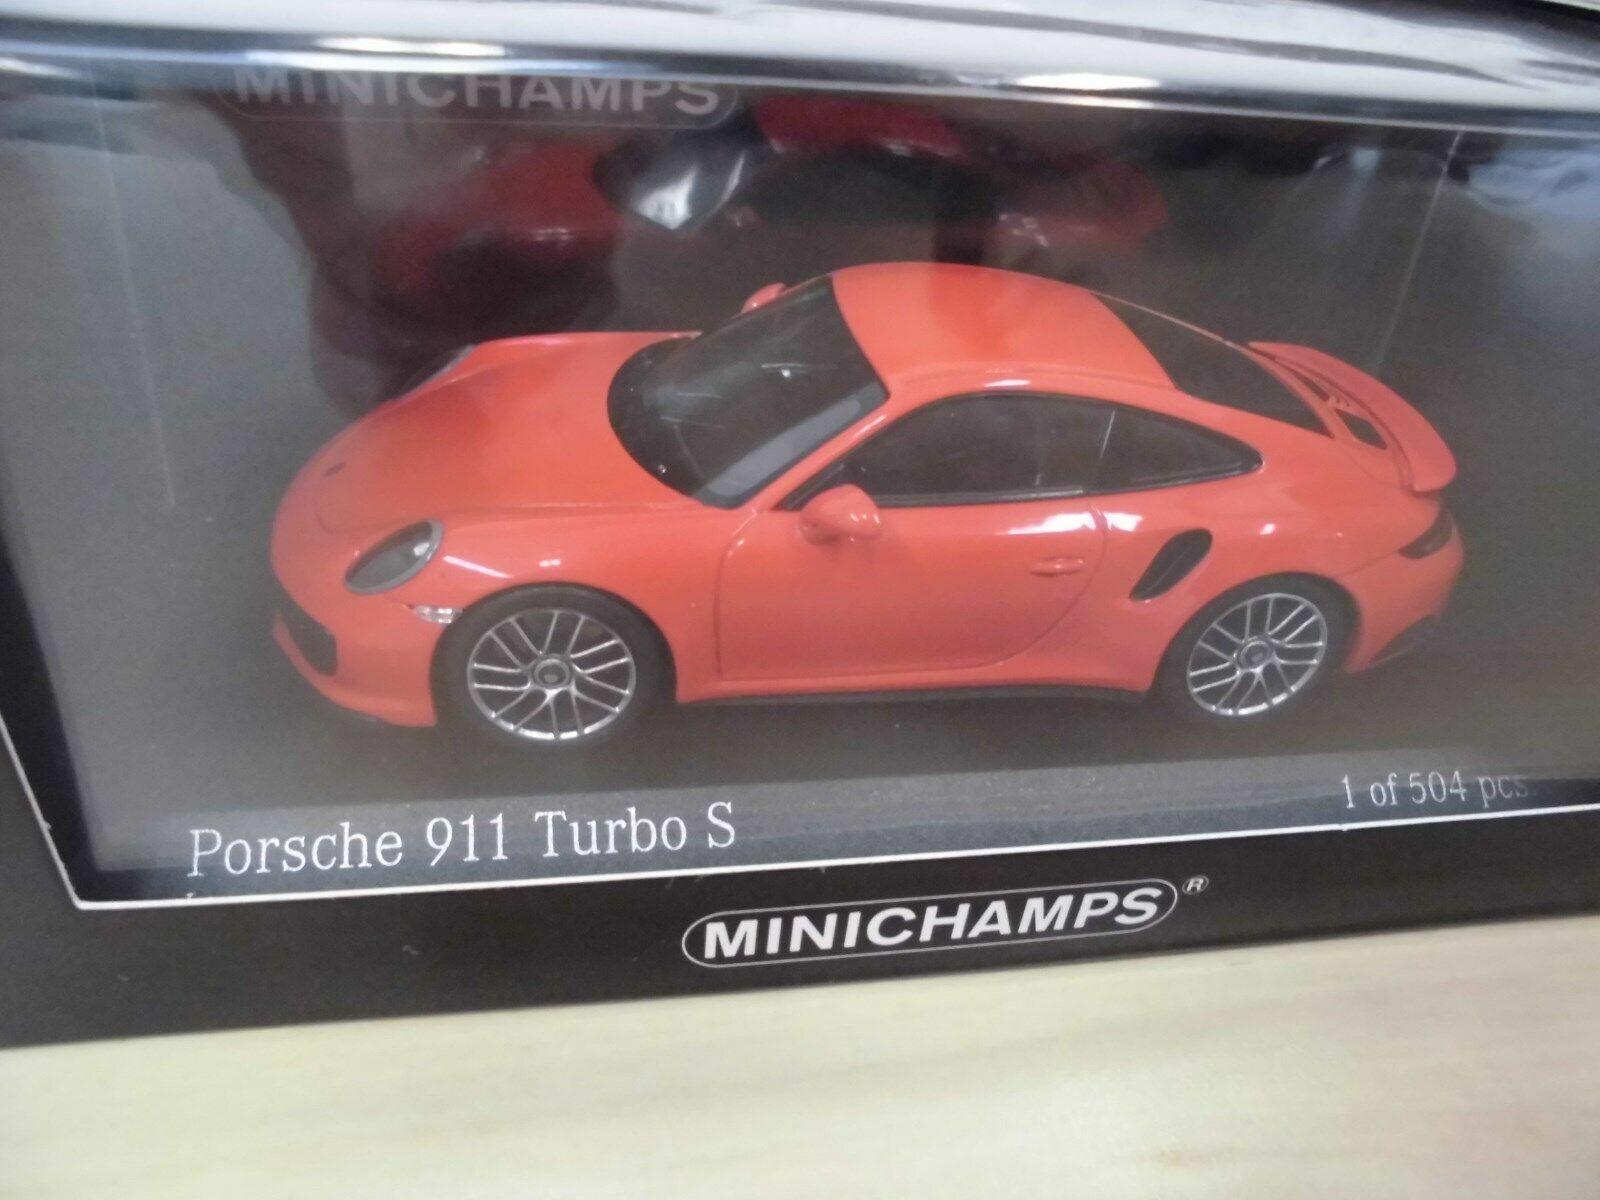 precios razonables Porsche 911 Turbo S (991 II) - - - lava-naranja-Minichamps 410 067171 - 1 43  Más asequible